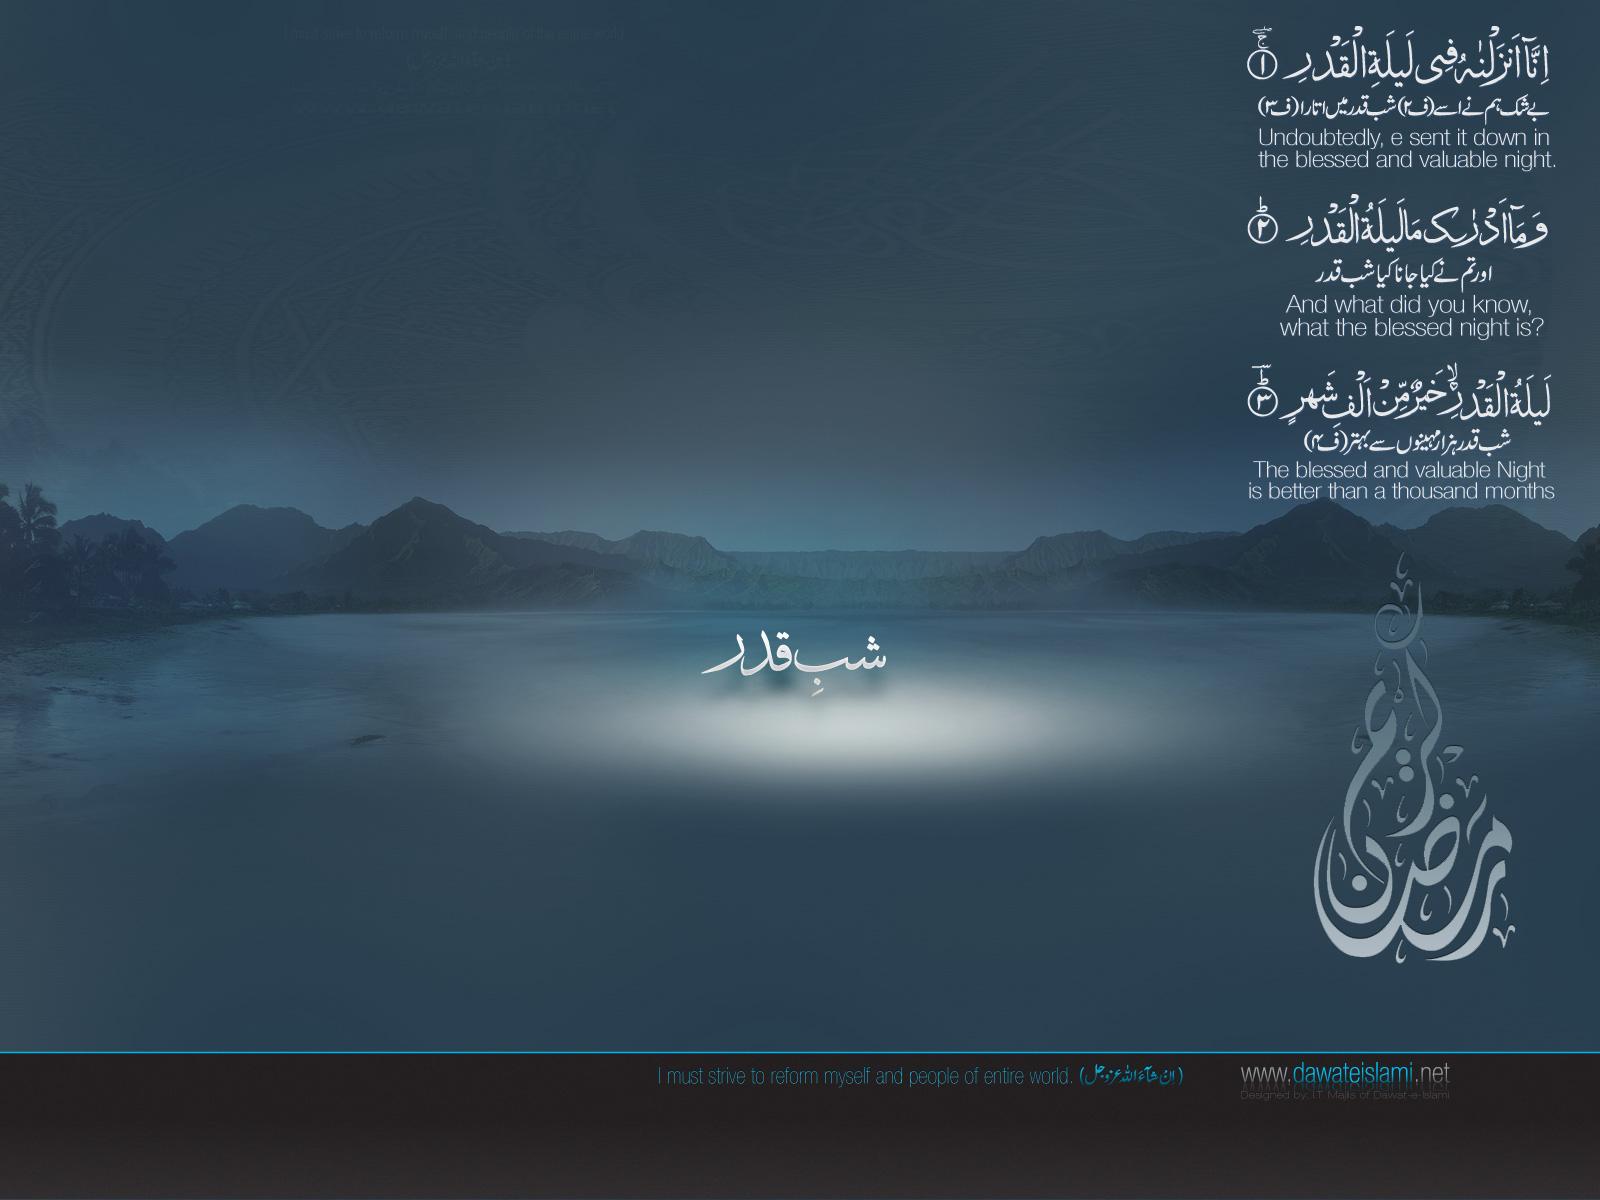 http://2.bp.blogspot.com/-VNwRsttBLS4/T_yk1PFHDtI/AAAAAAAAAUo/NbKNKHsRpyM/s1600/ramadan+kareem_wallpapers_by_dawateislami_9.jpg